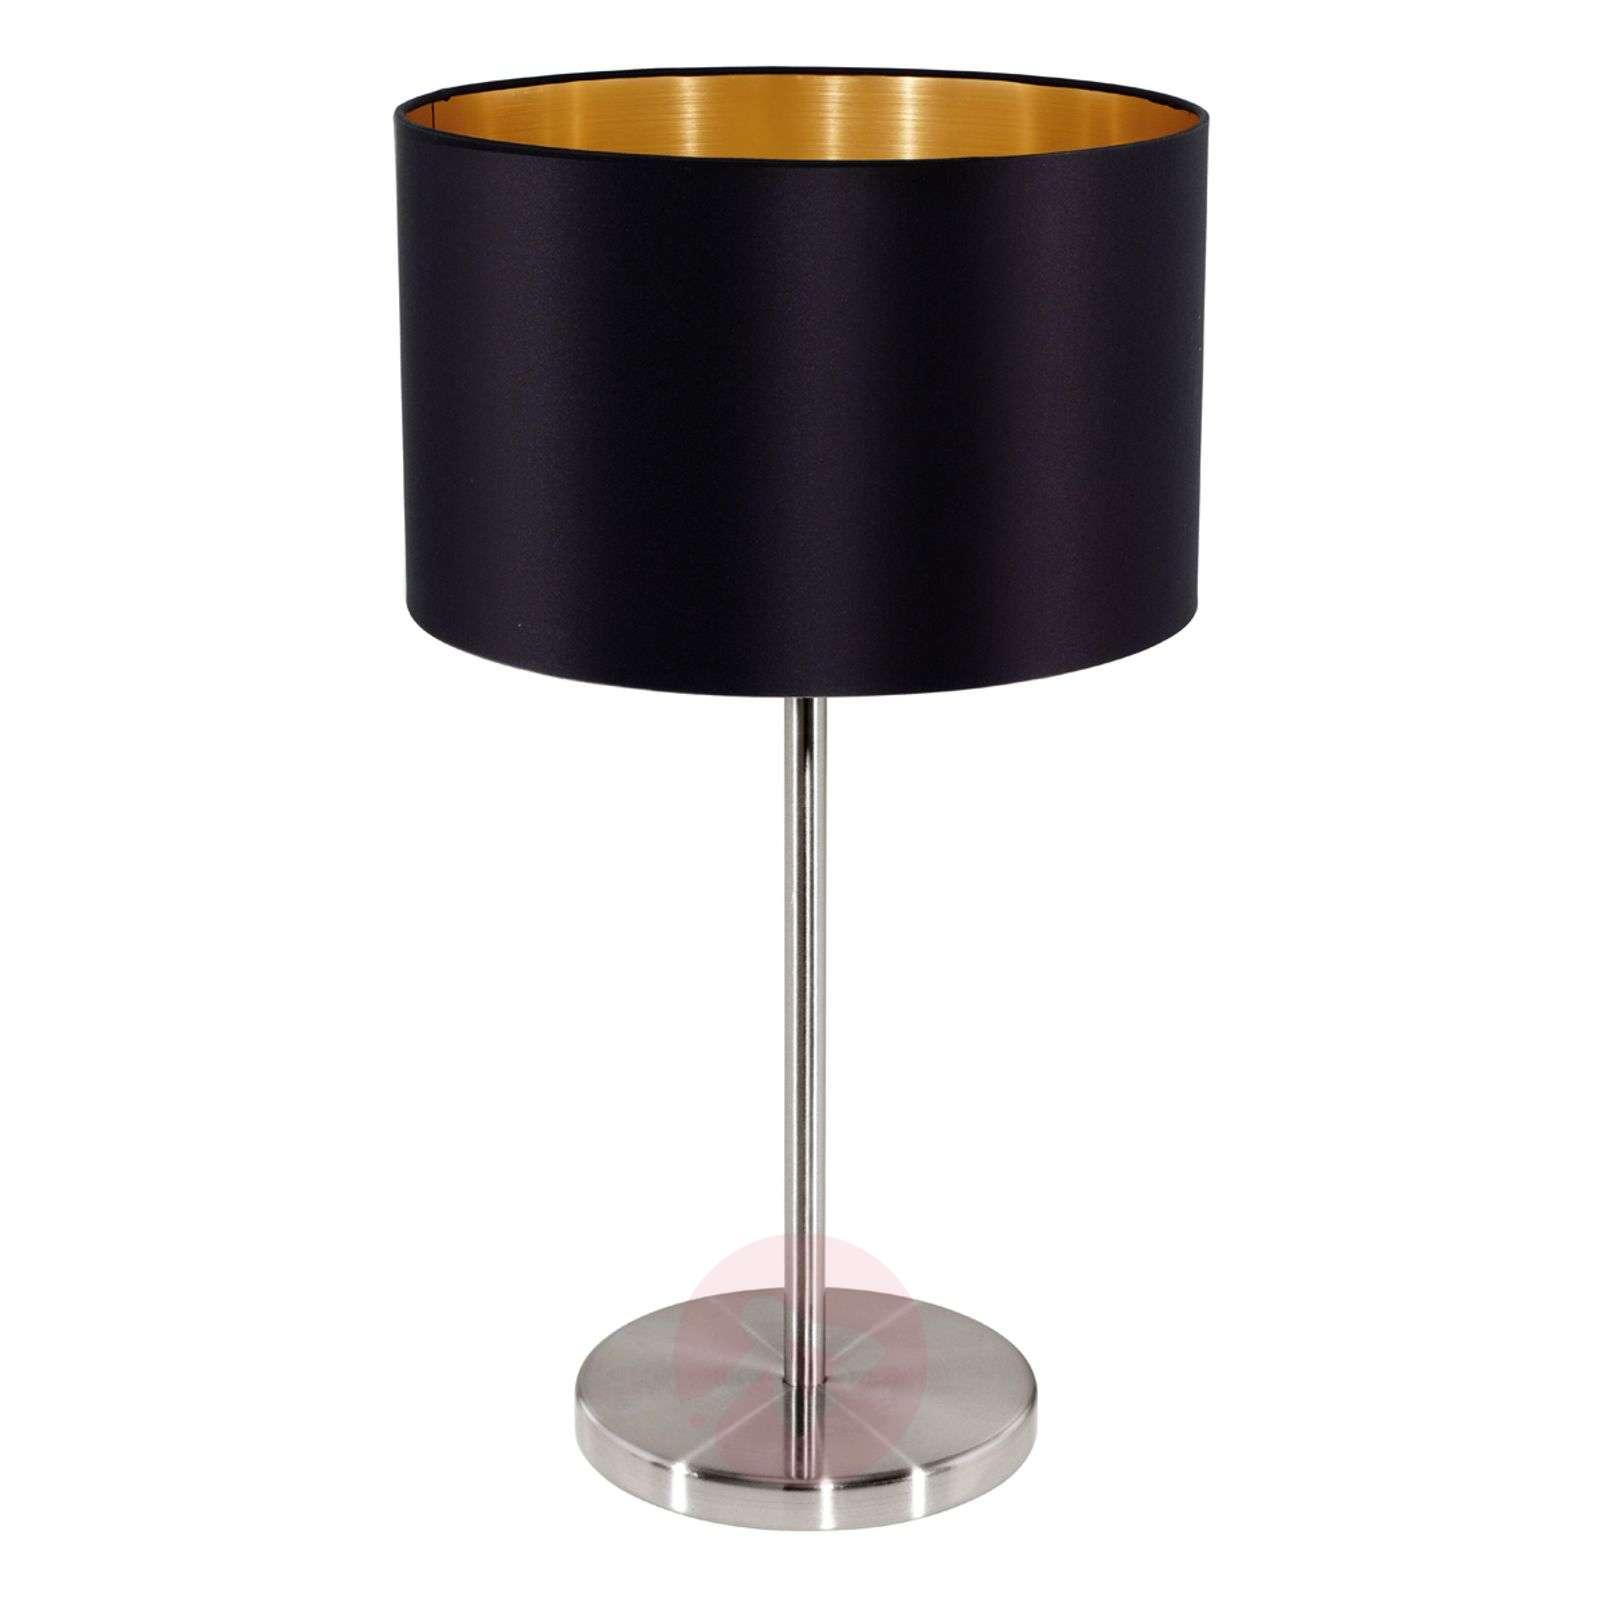 Simple Lecio fabric table lamp-3031700-02